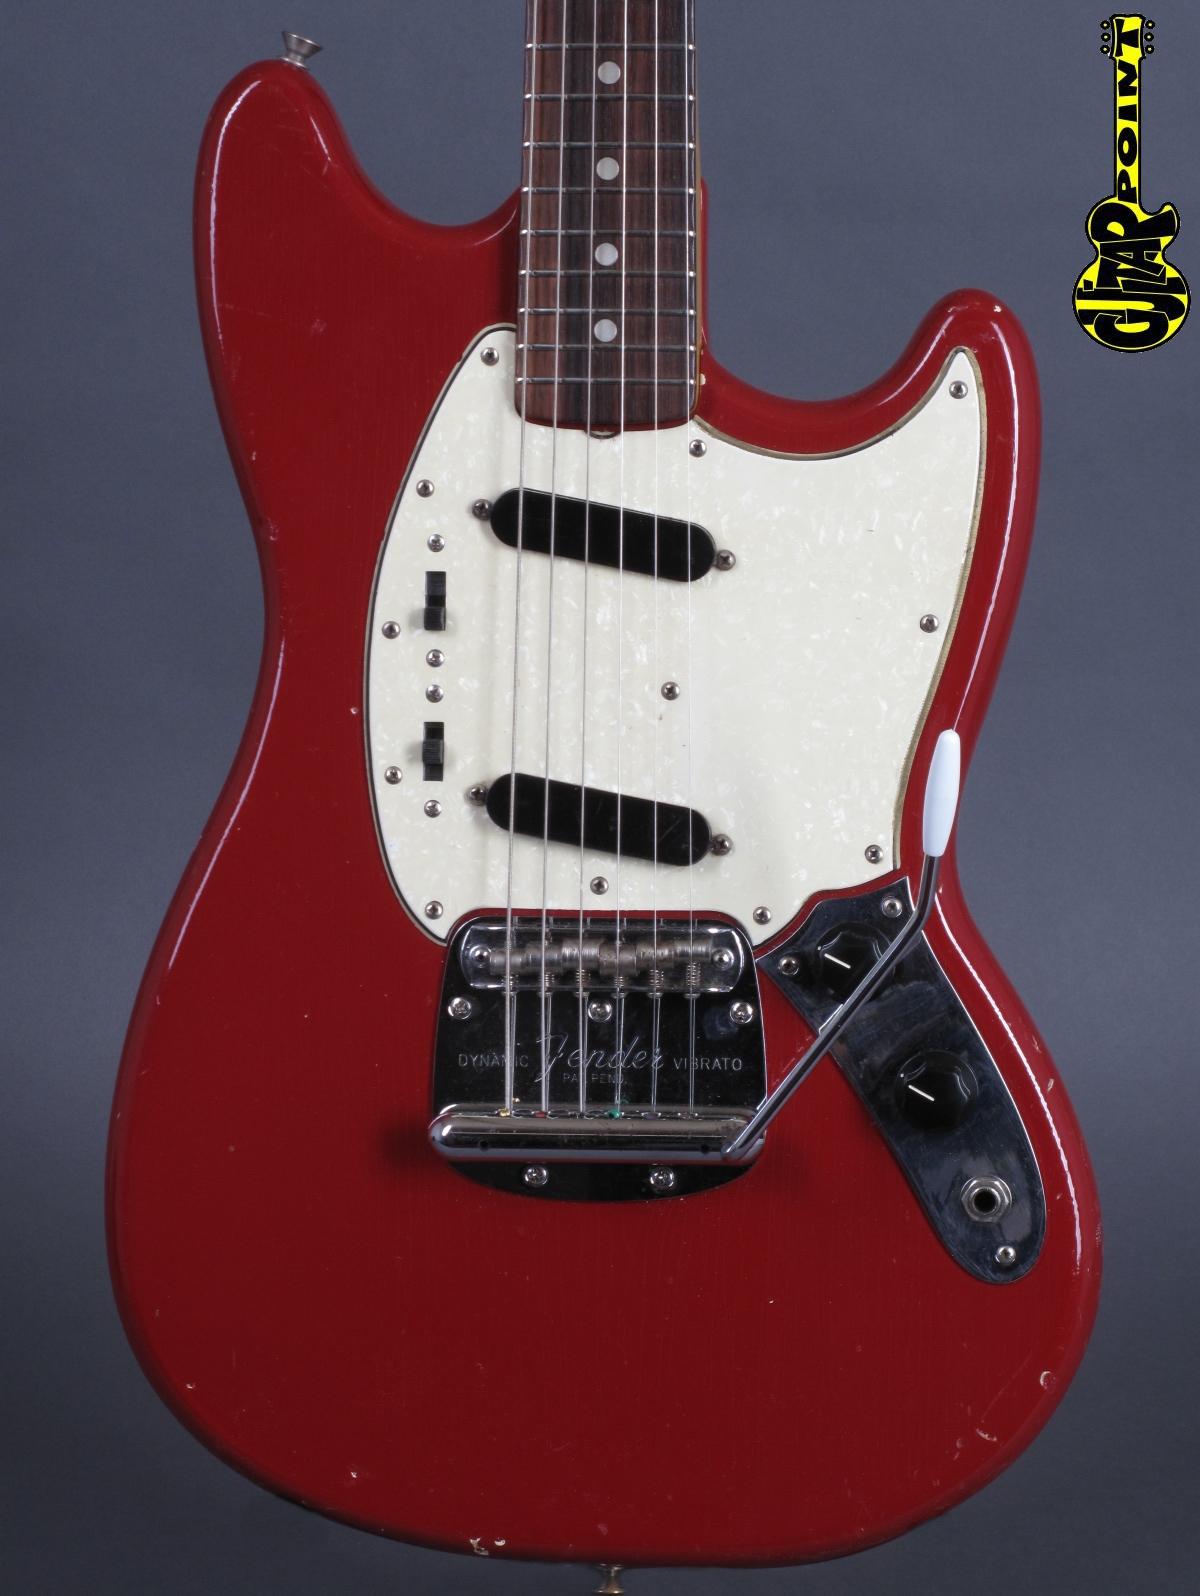 1966 Fender Mustang - Dakota Red   ...Abigail Ybbara PU´s !